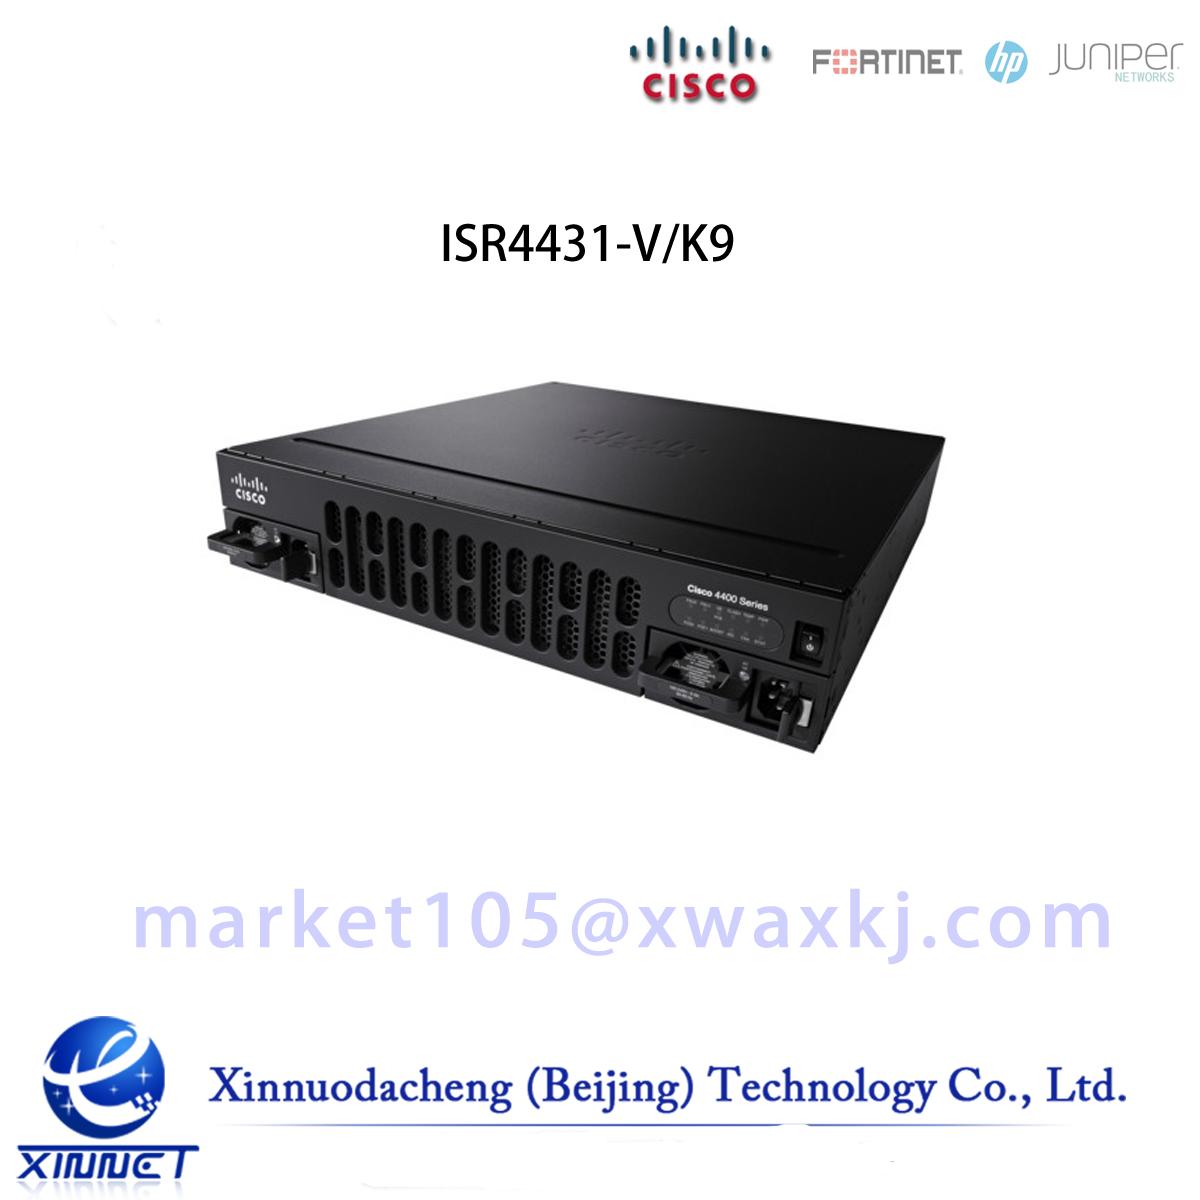 ISR4431-V/K9 Cisco ISR 4431 UC Bundle, PVDM4-64, UC License, CUBE-25